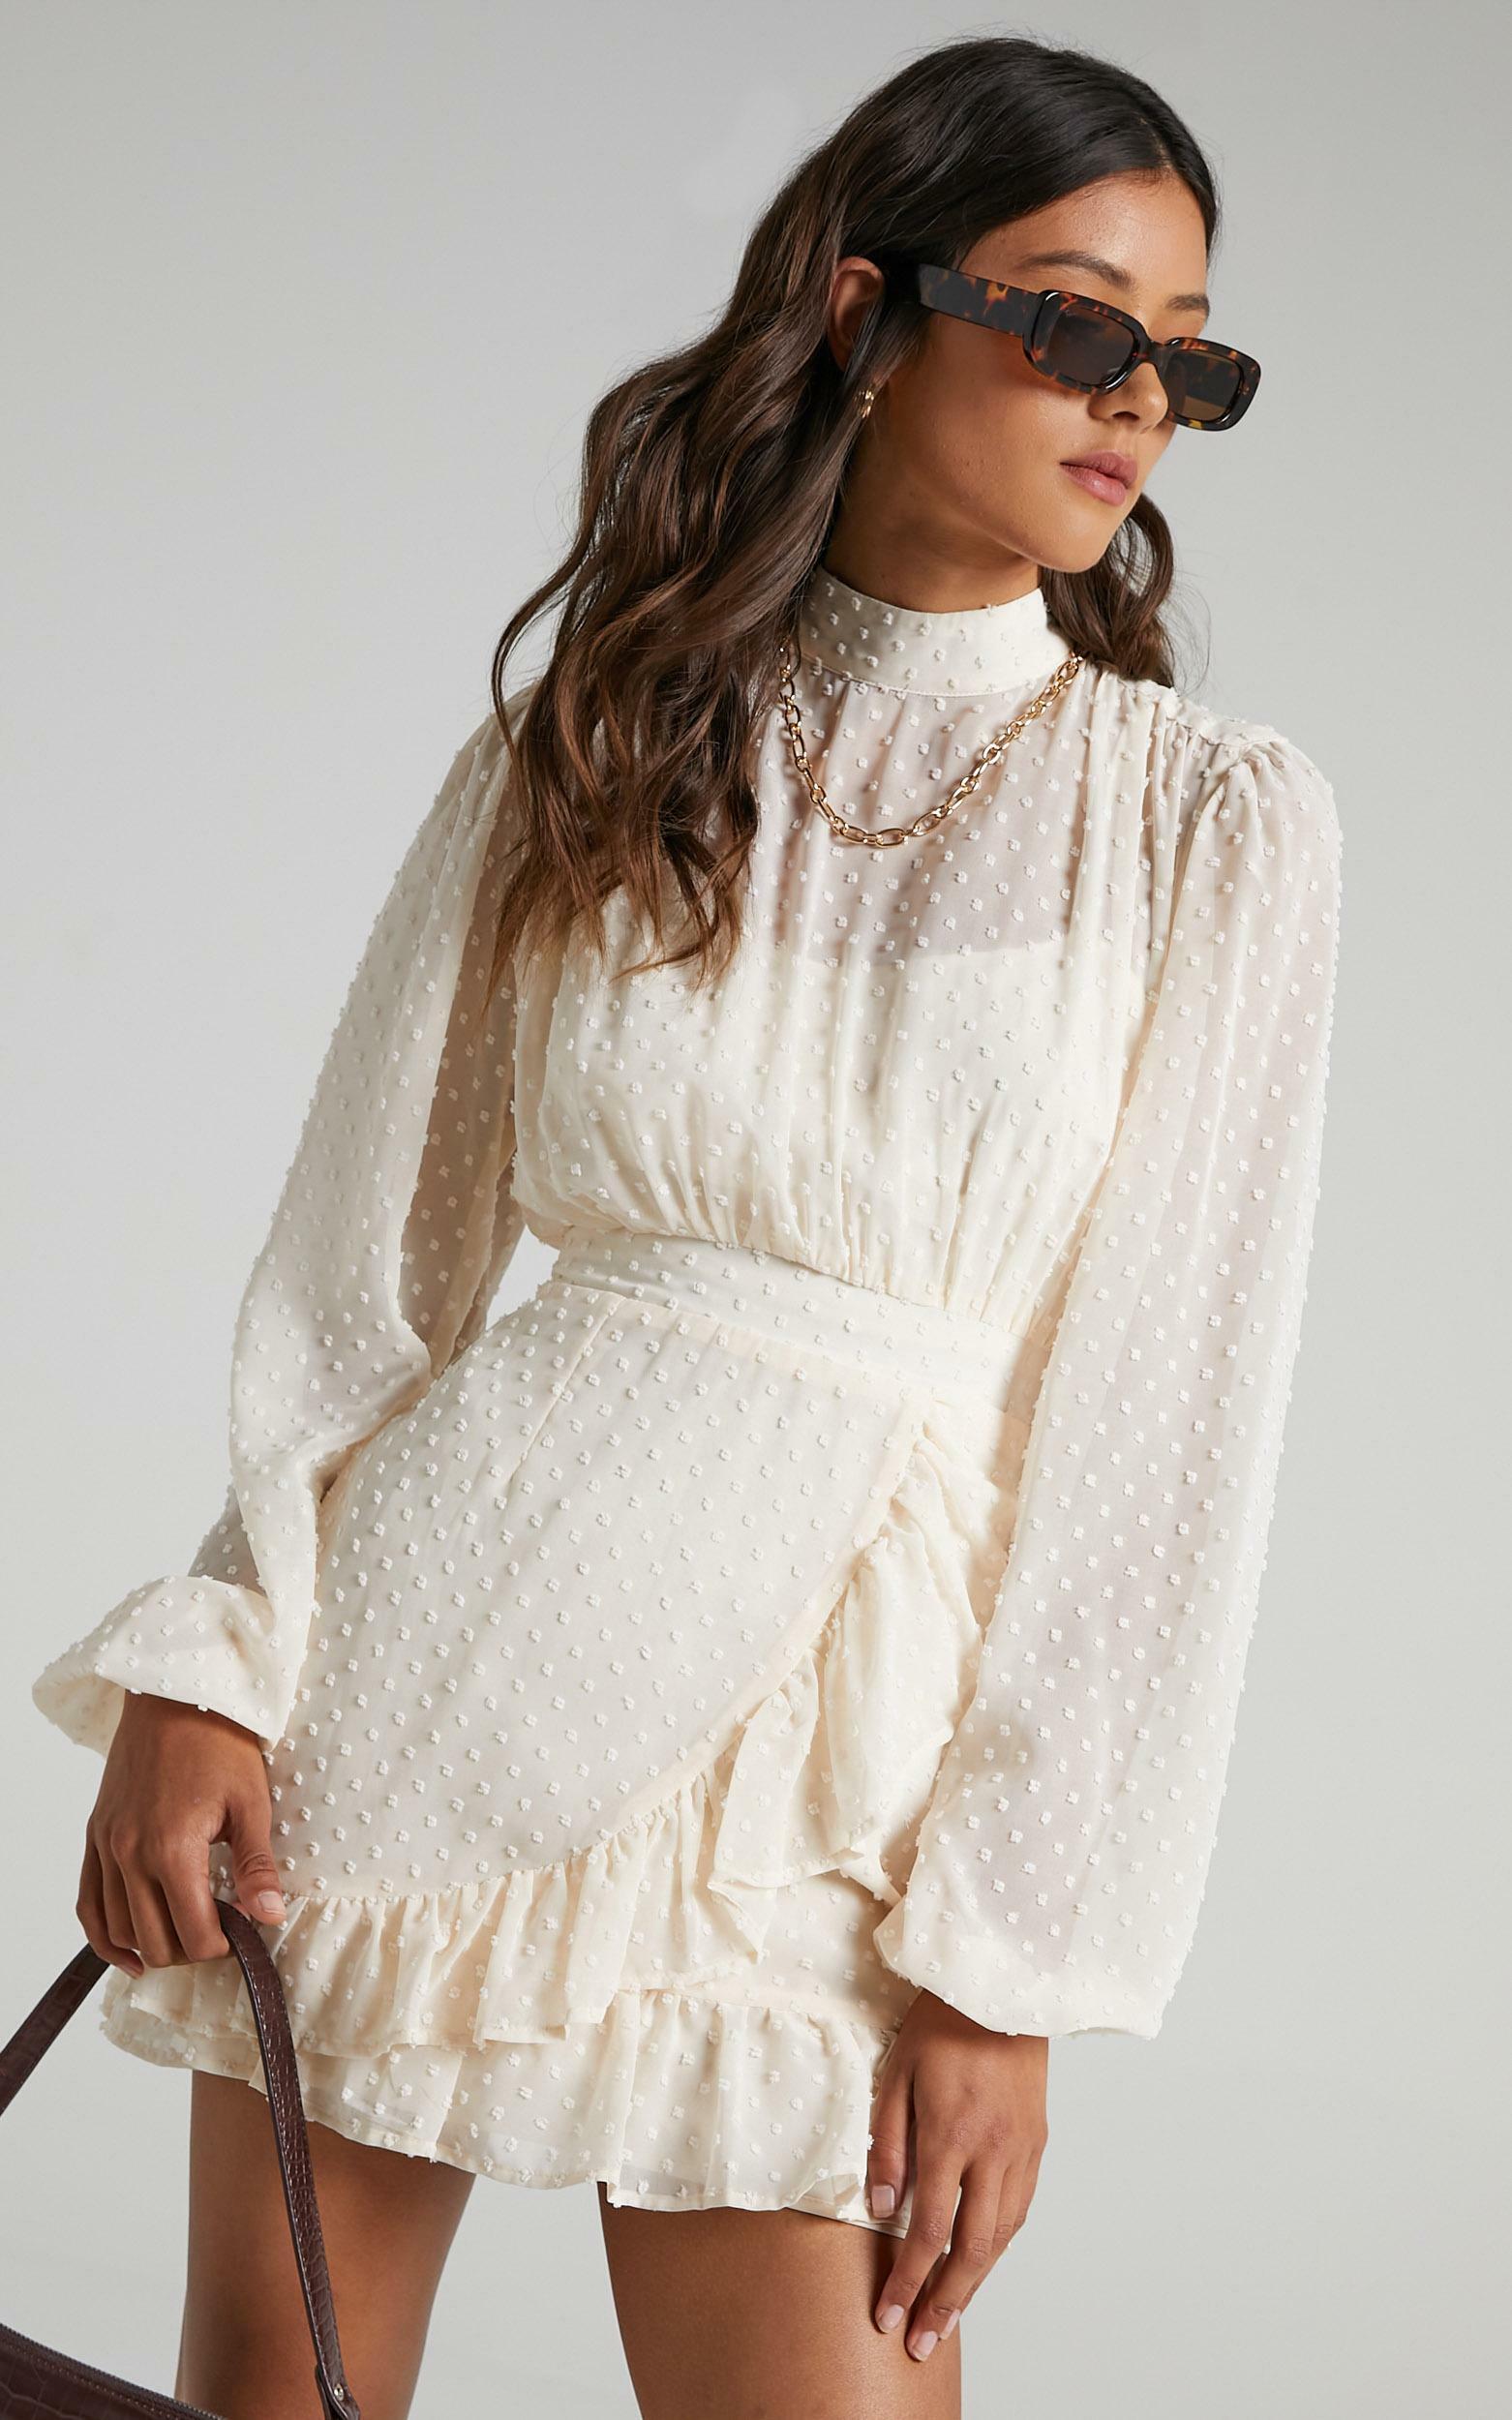 Tiahna Dress in Cream - 04, CRE2, hi-res image number null